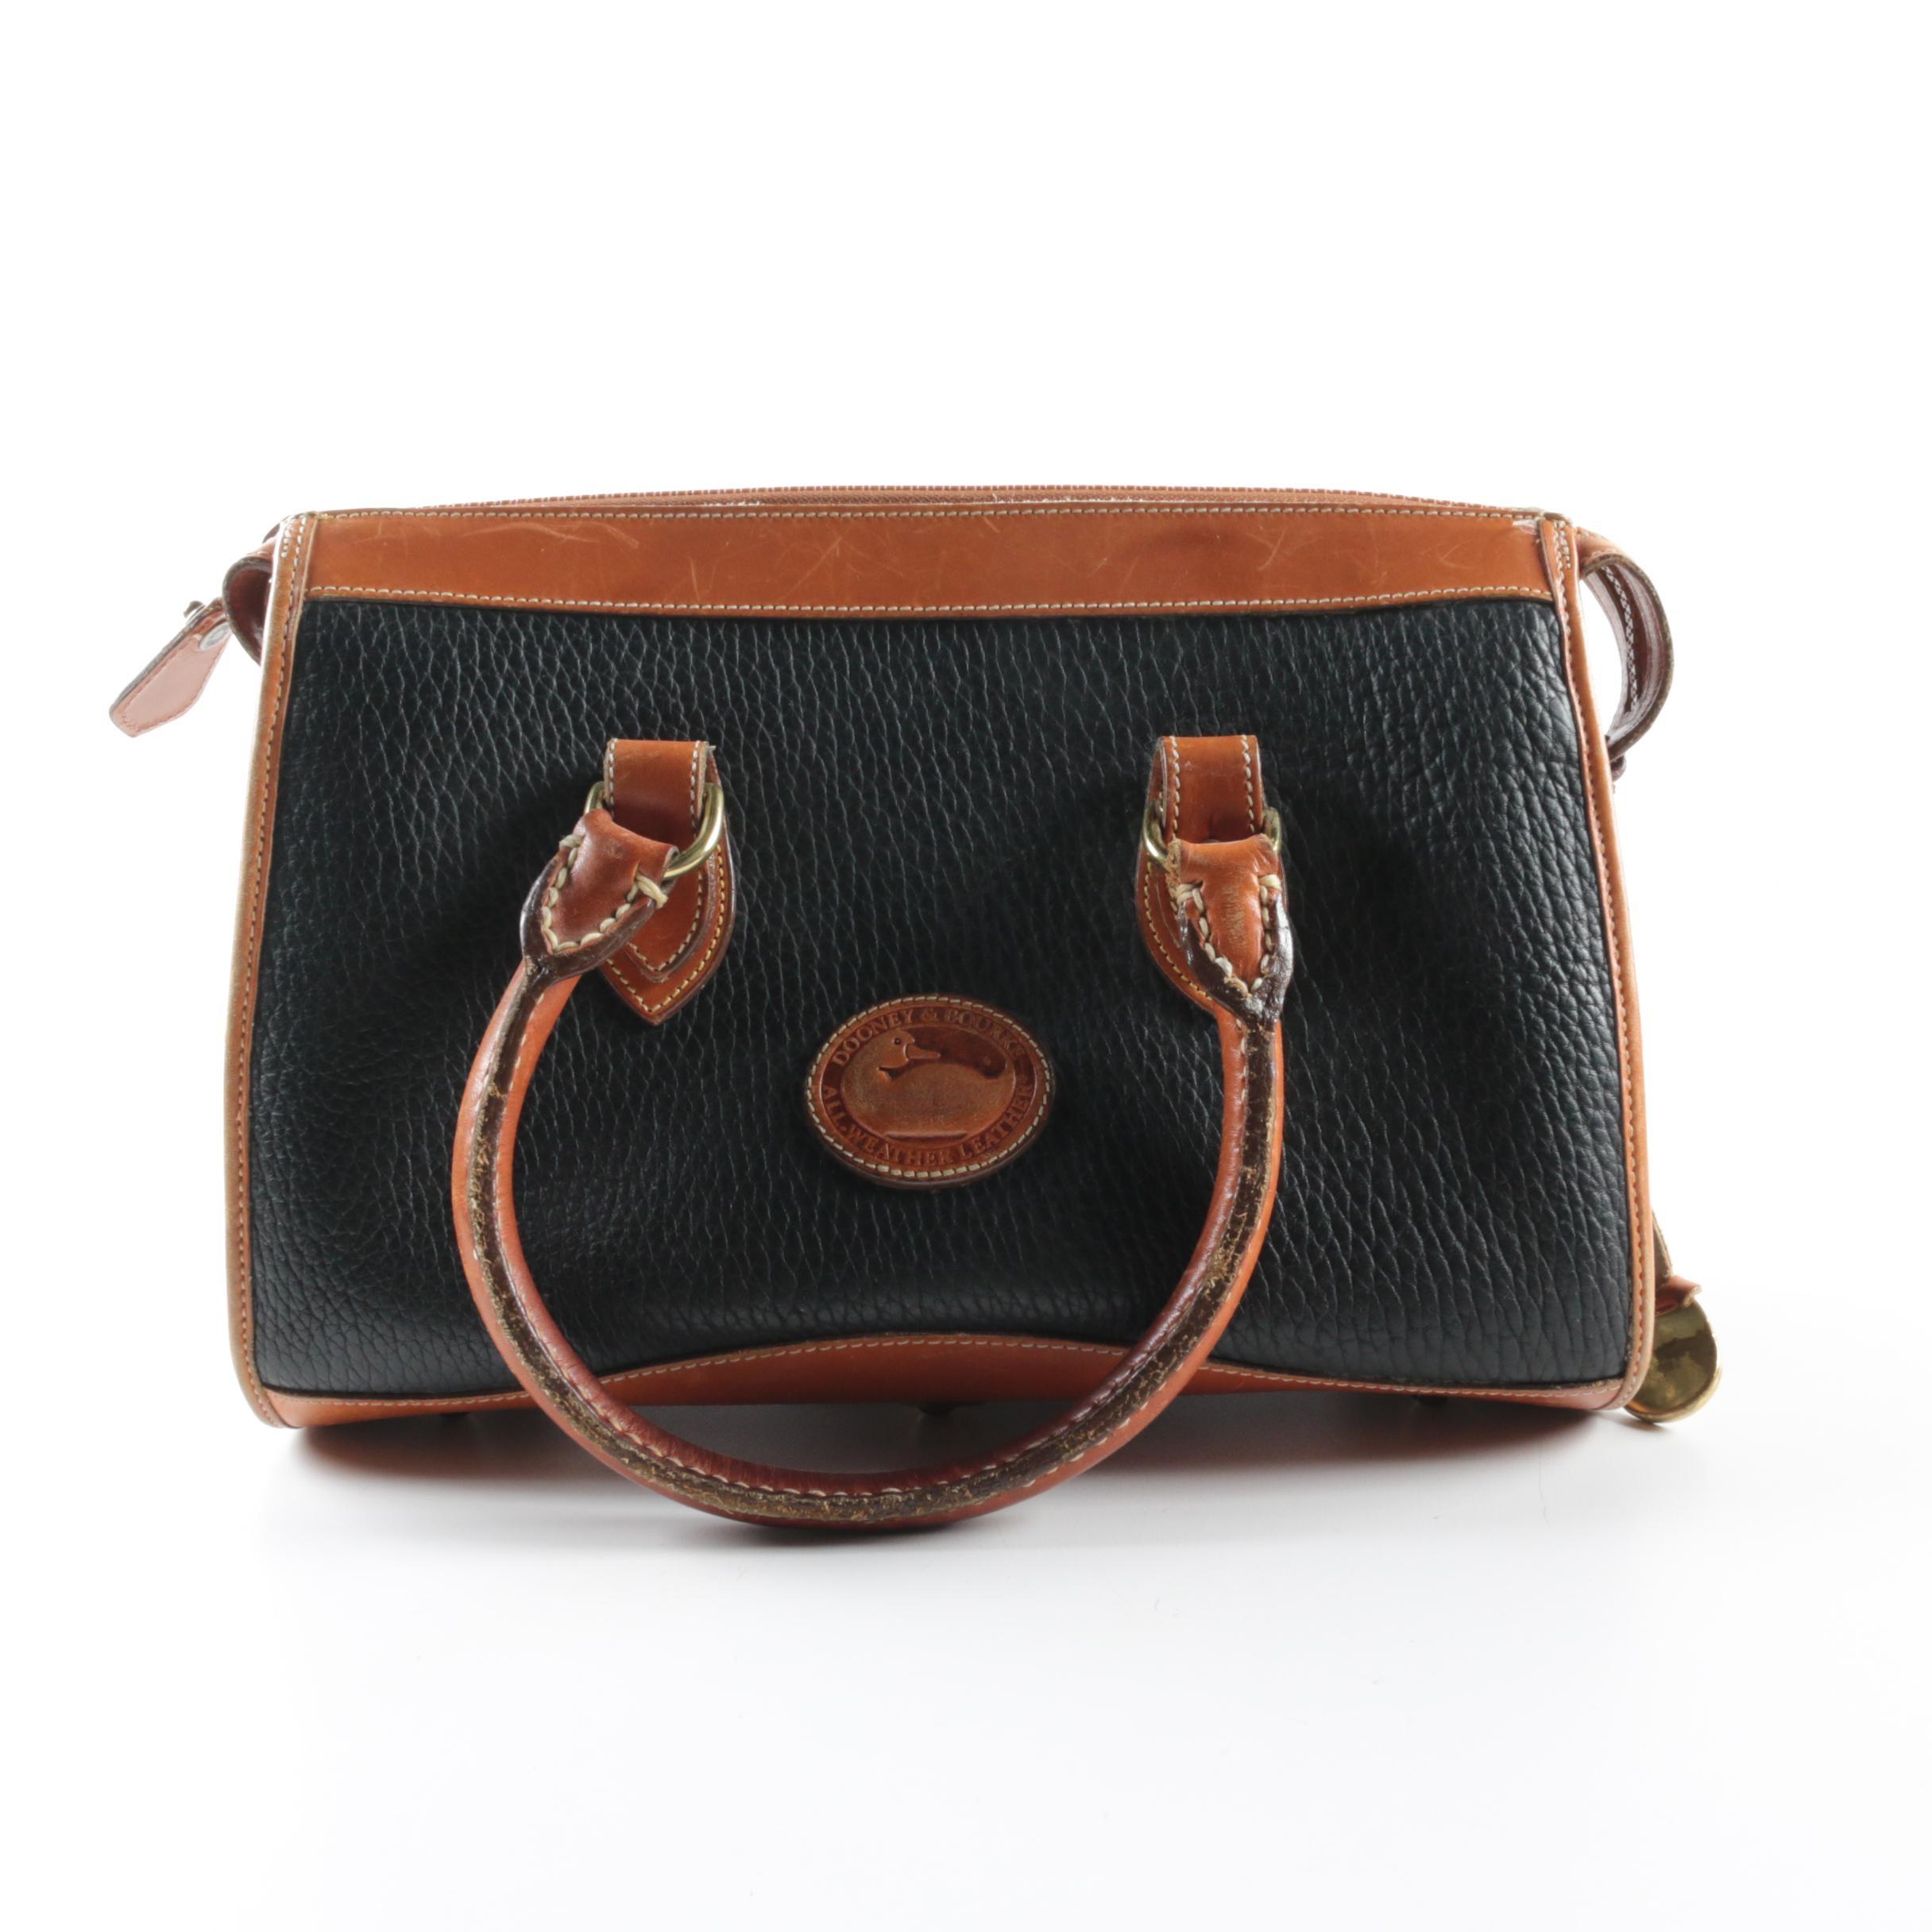 Dooney & Bourke All Weather Pebbled Leather Handbag